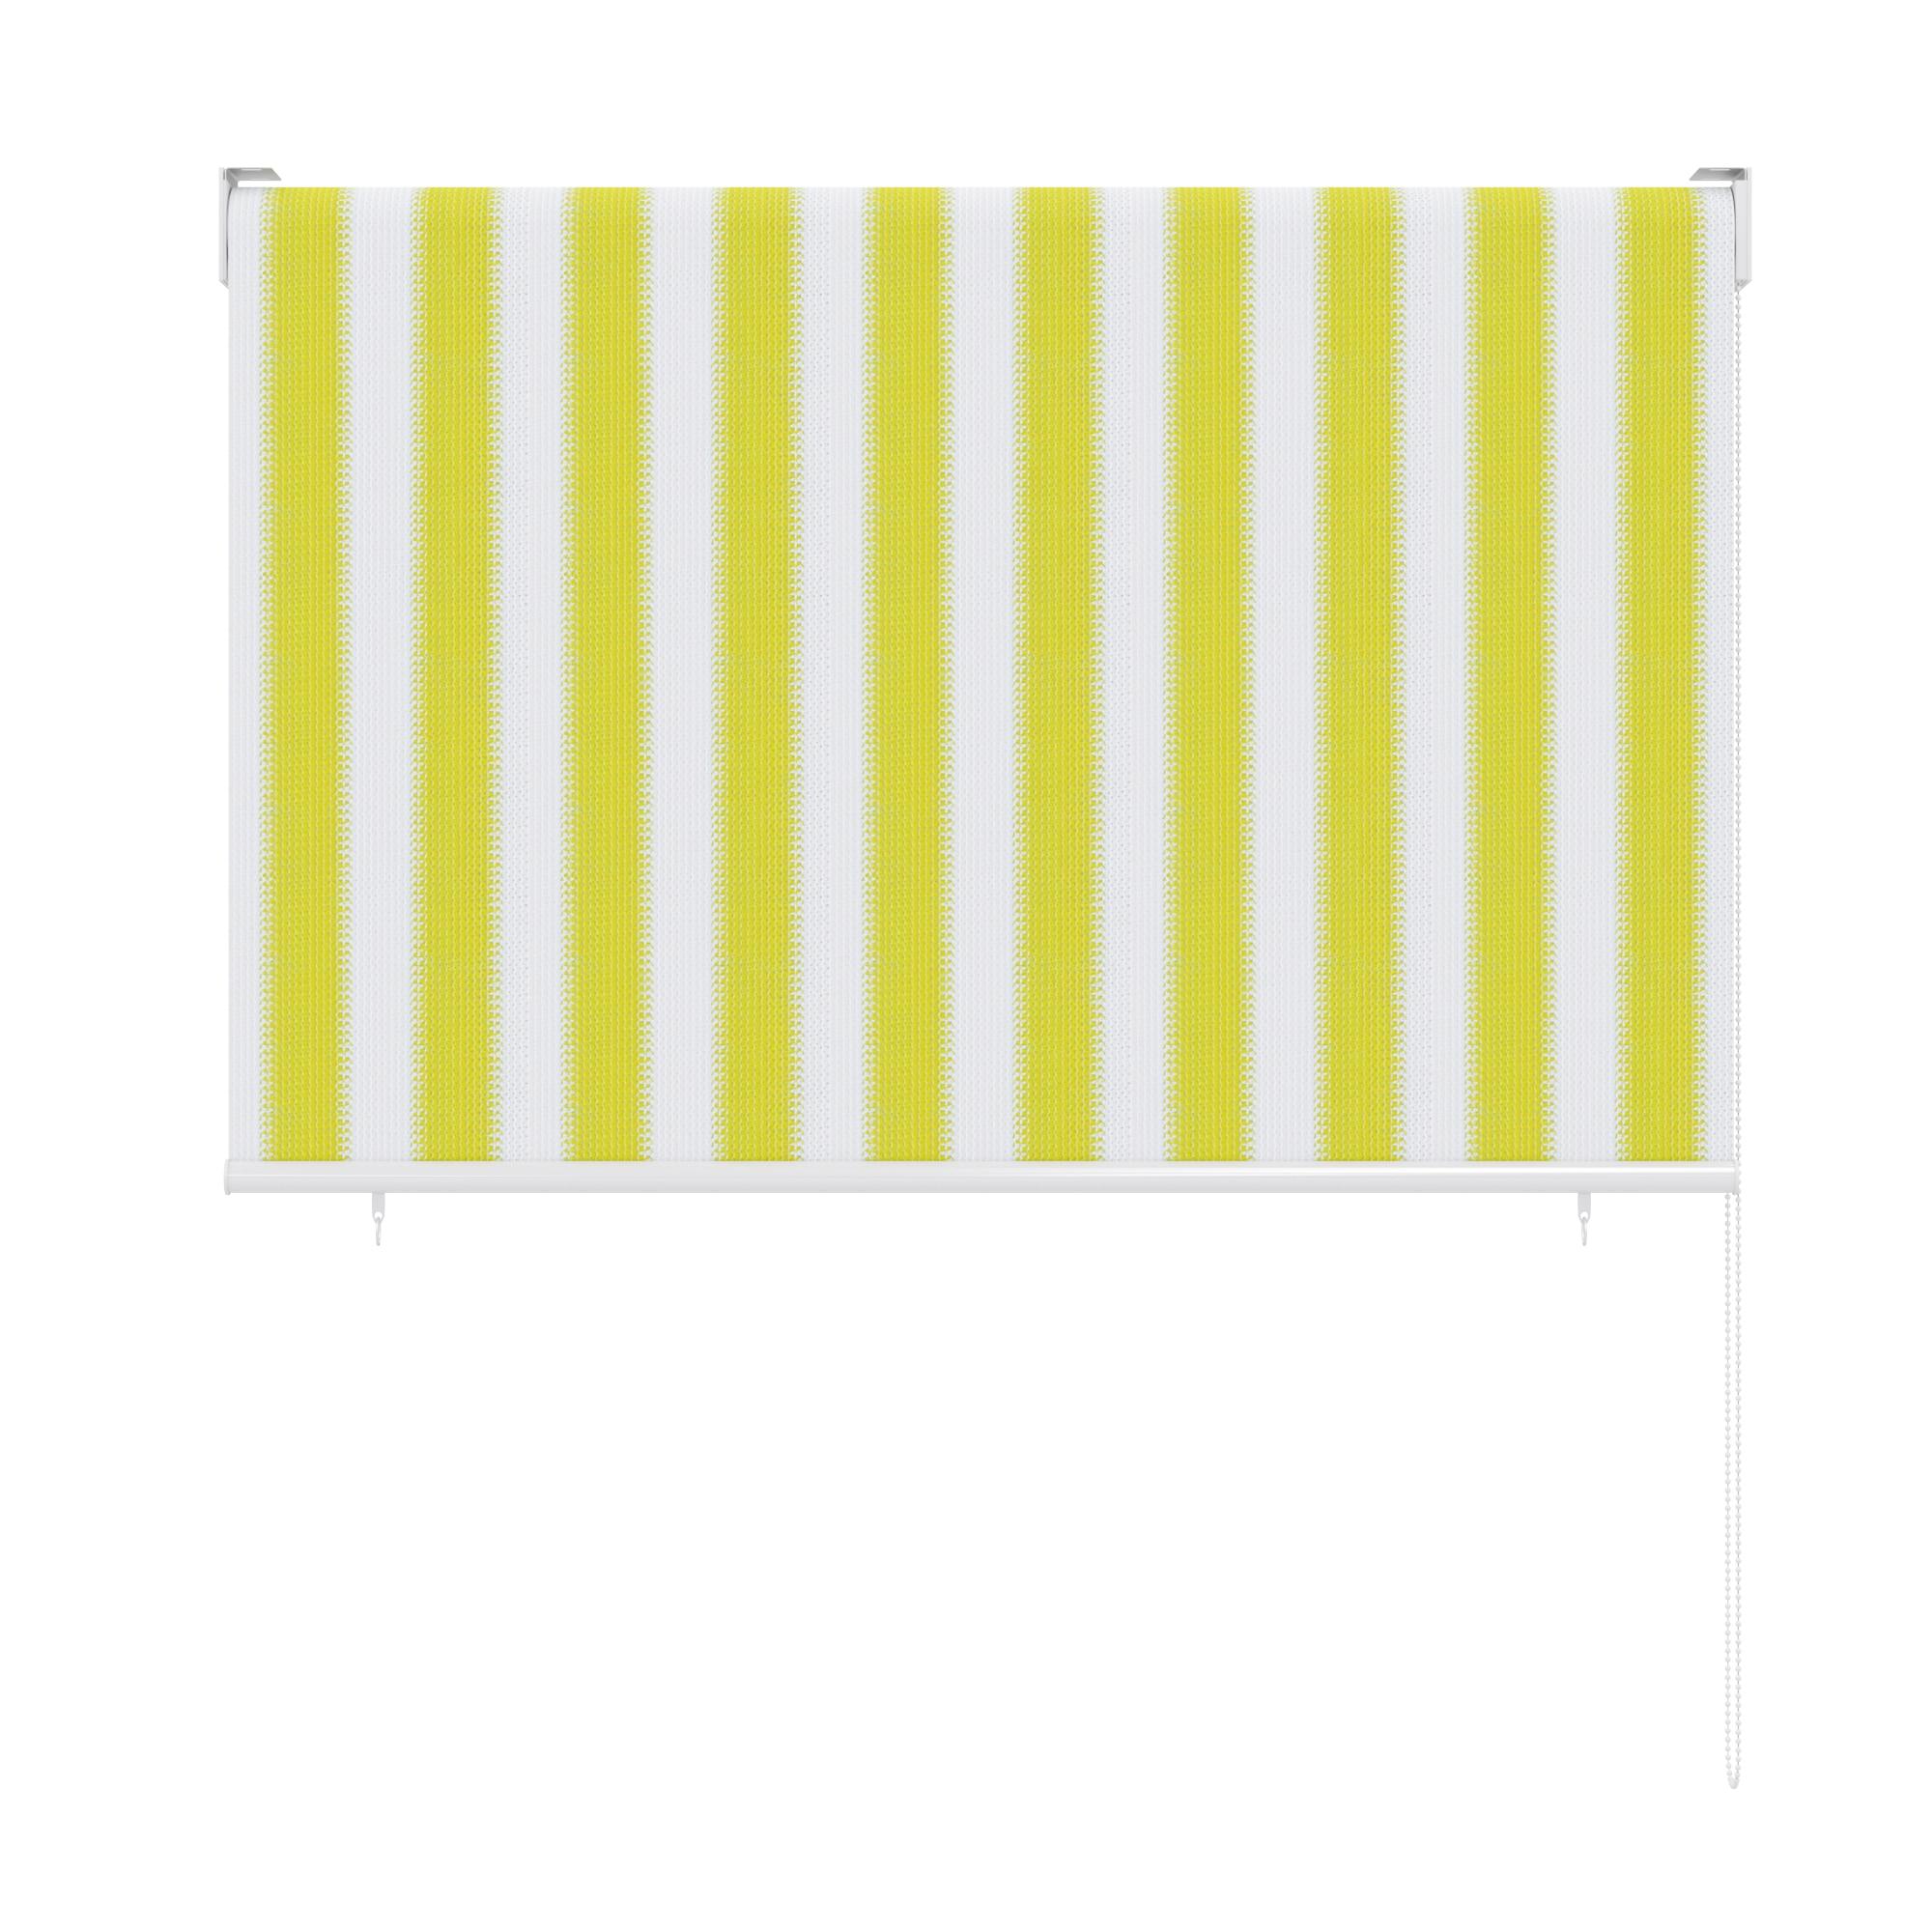 JAROLIFT-Senkrechtmarkise-Sichtschutz-Aussenrollo-Sonnenschutz-Aussen-Rollo-Balkon Indexbild 24